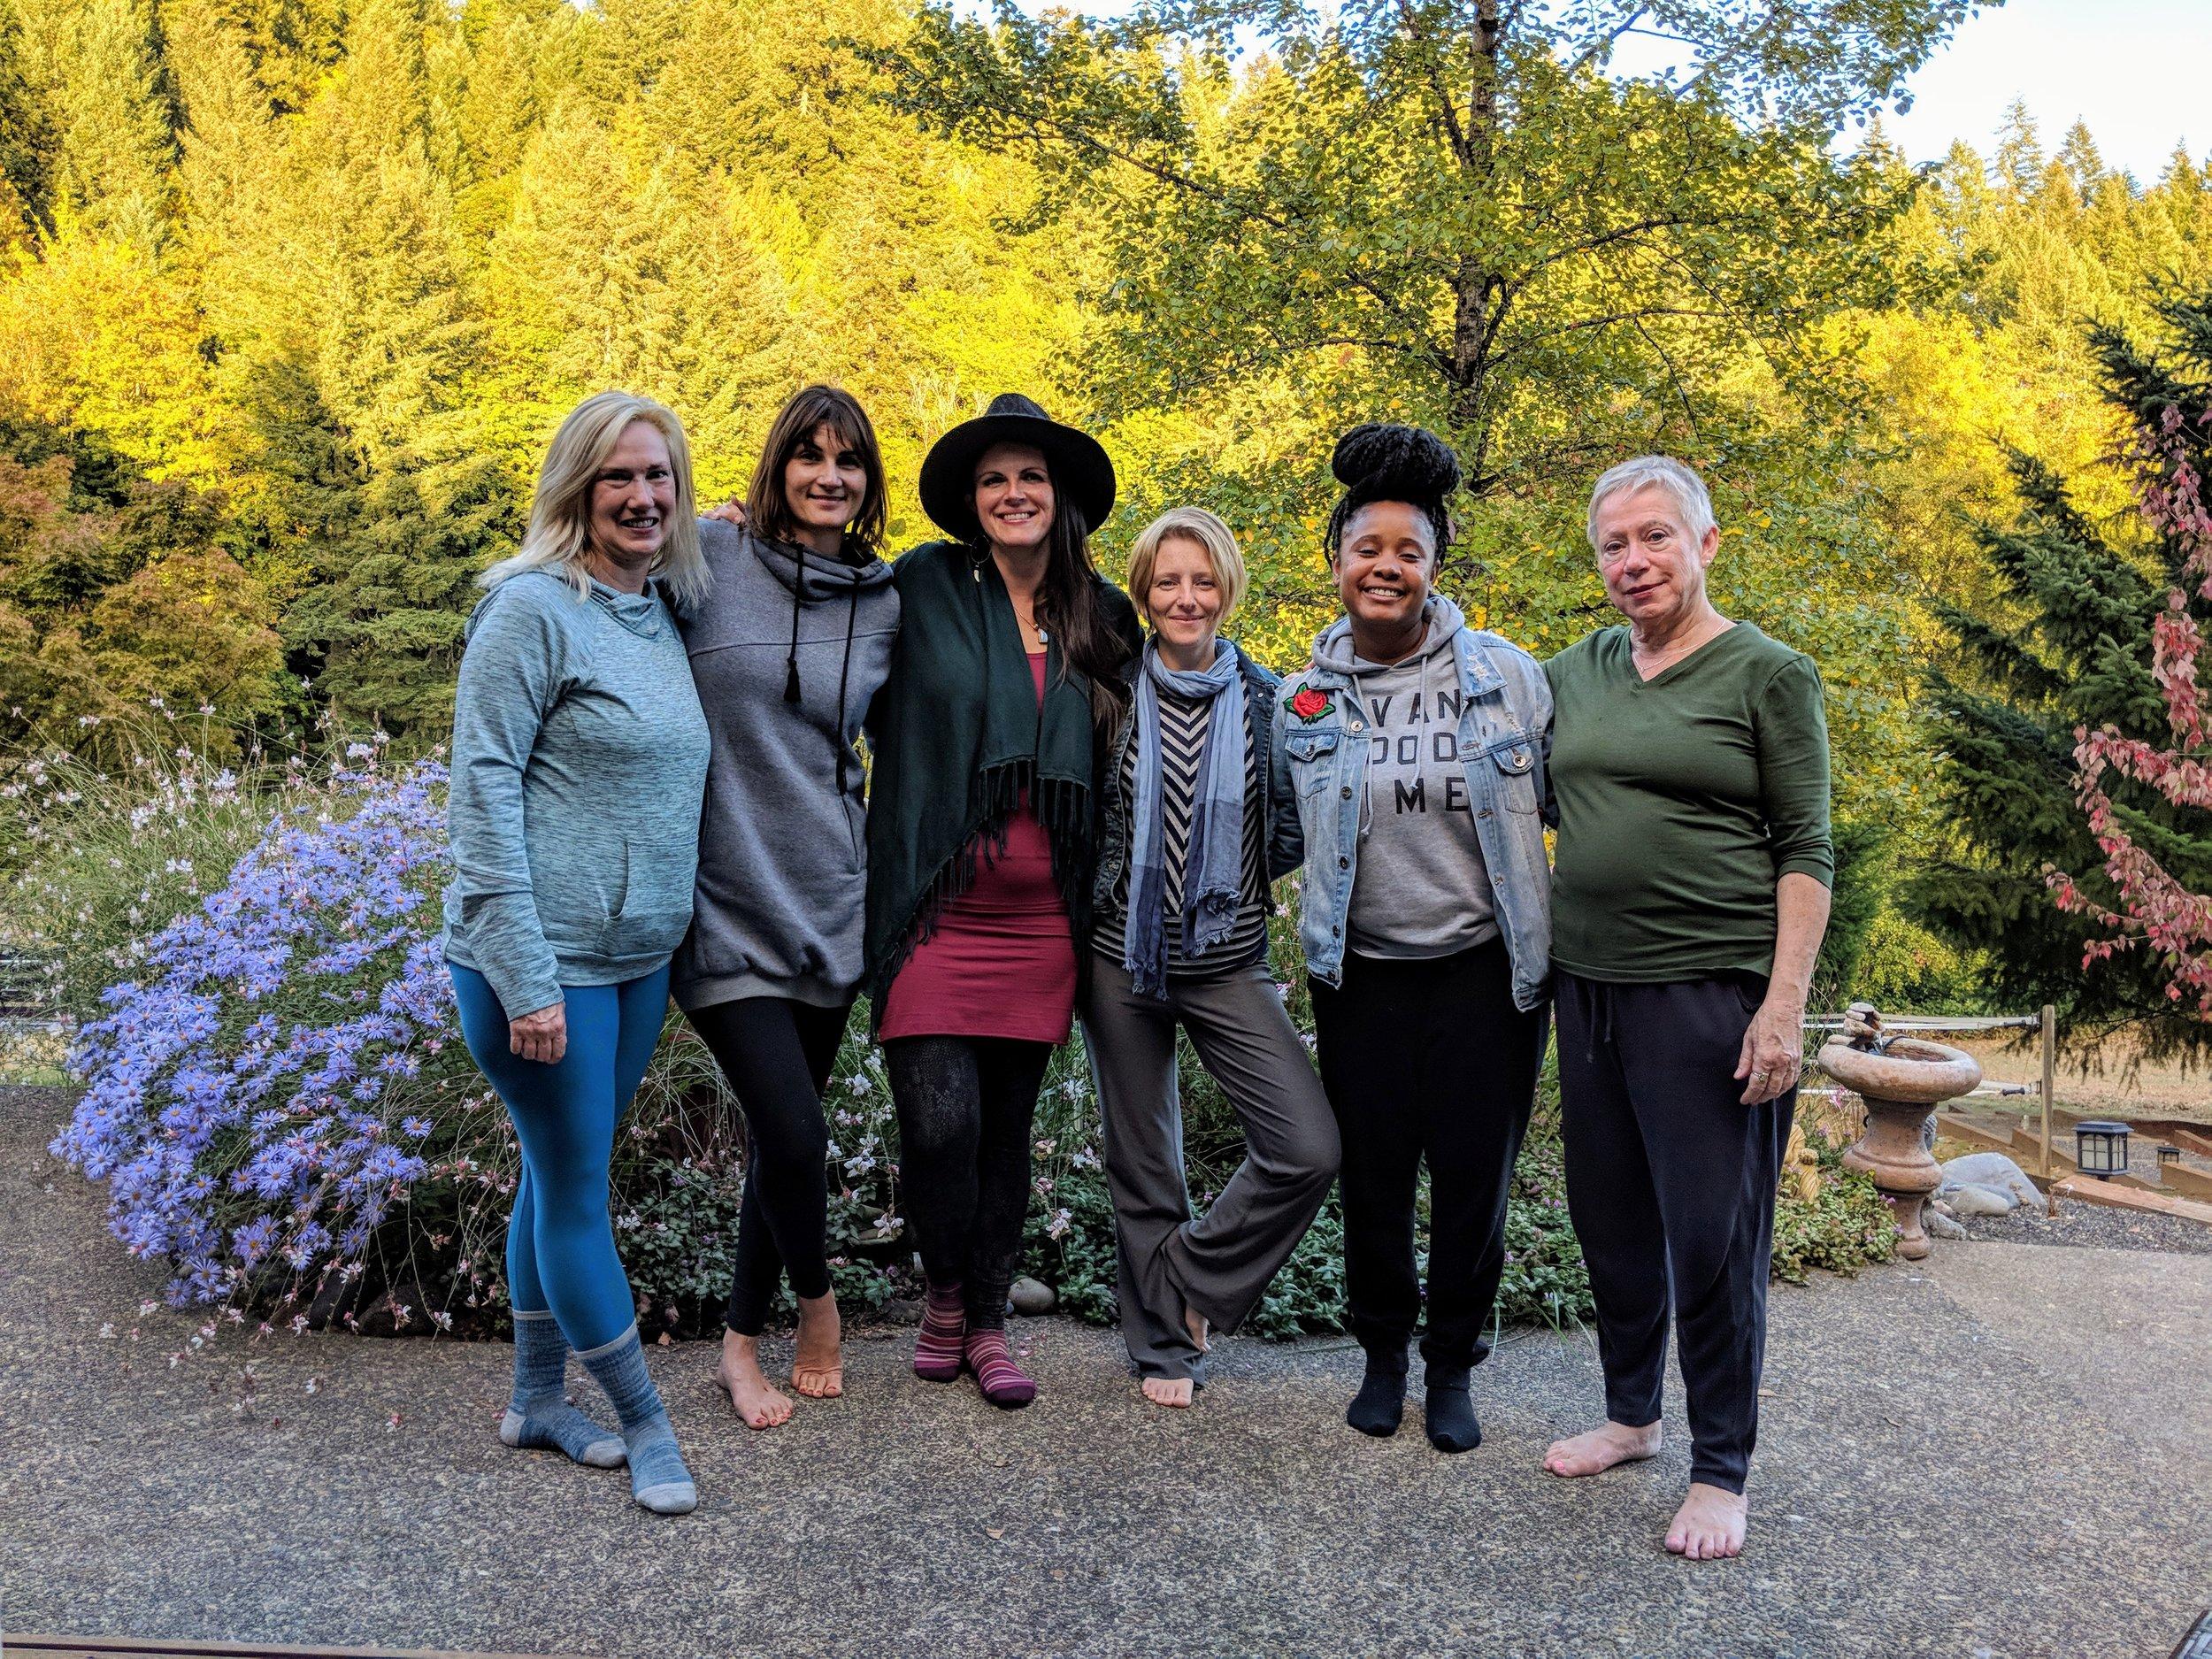 Lightworker Portal Spiritual Community Shaman Alchemist Michelle Hawk Mentor Portland